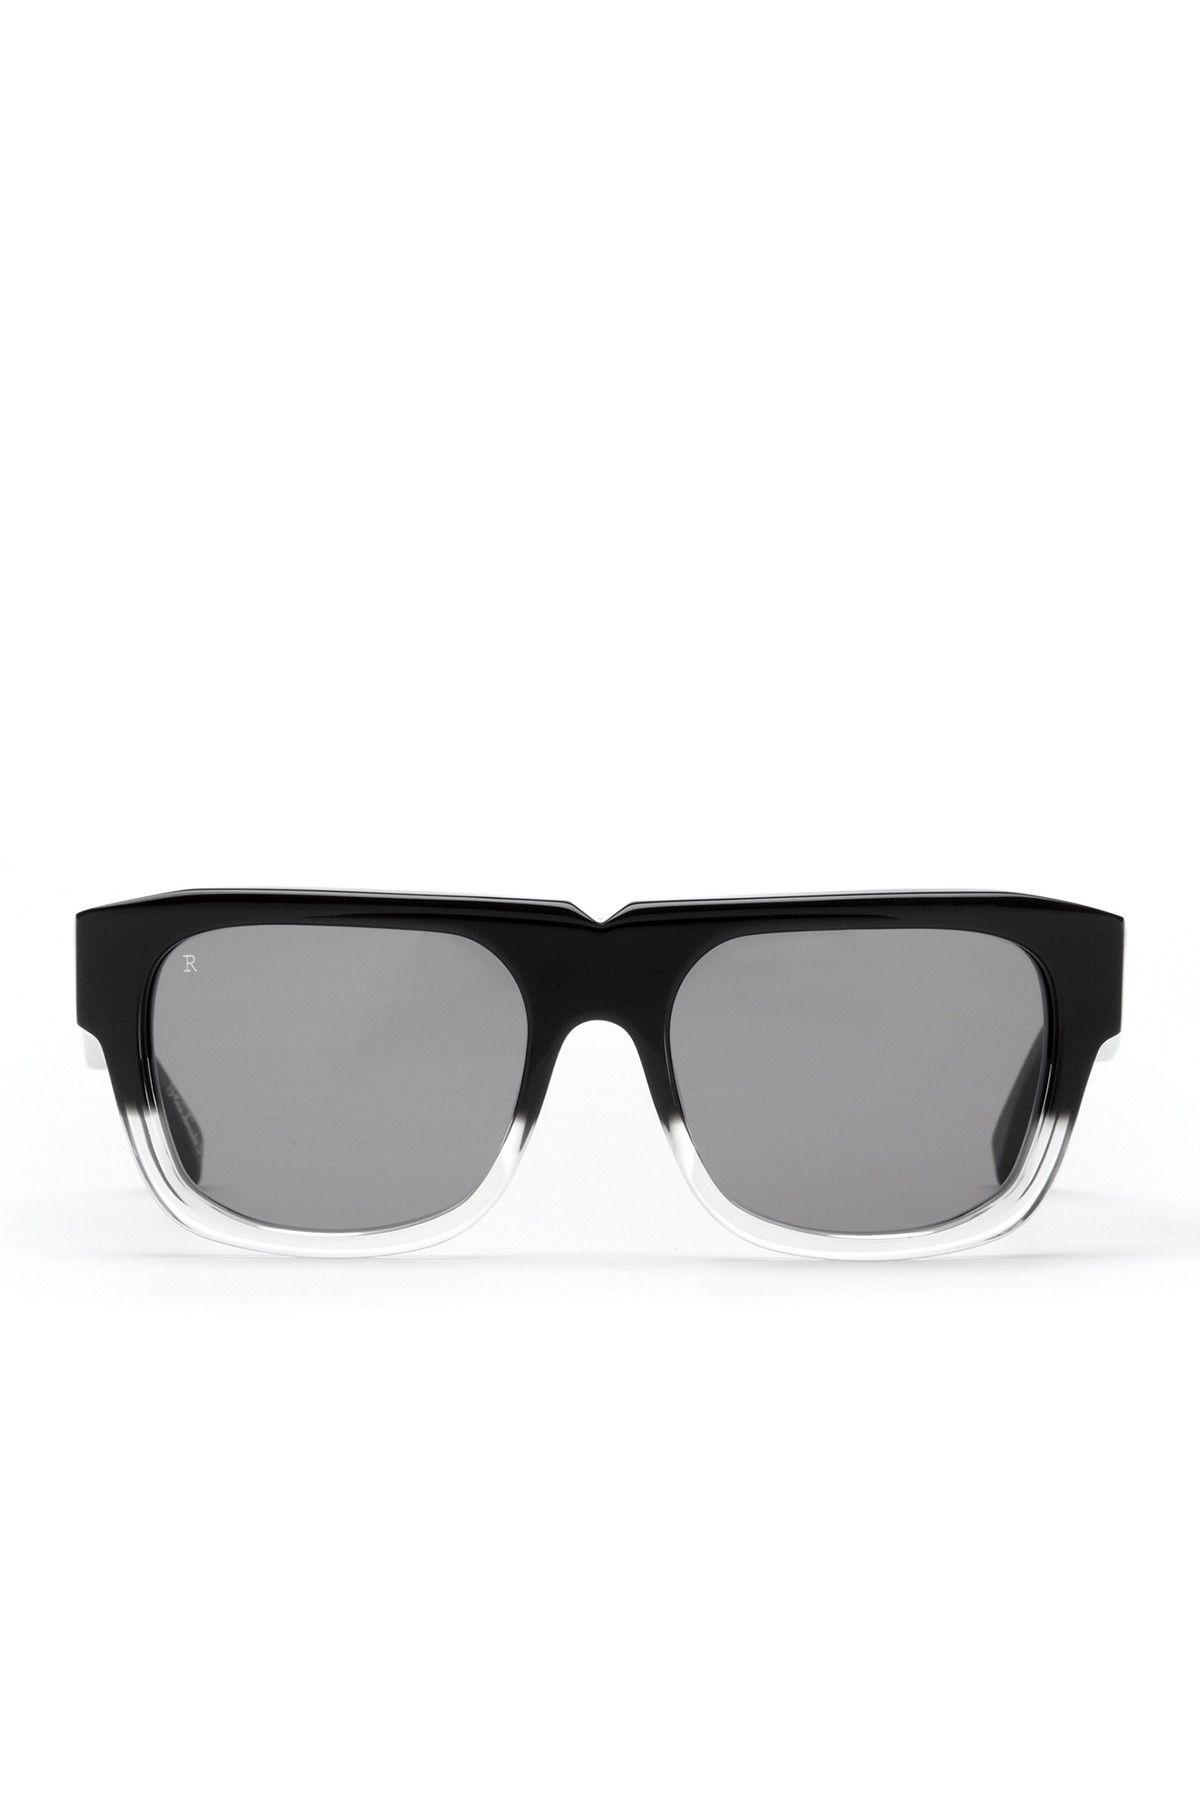 Raen Unisex Coda Square Sunglasses   Eyewear   Pinterest   Moda 7c18f4ee3f